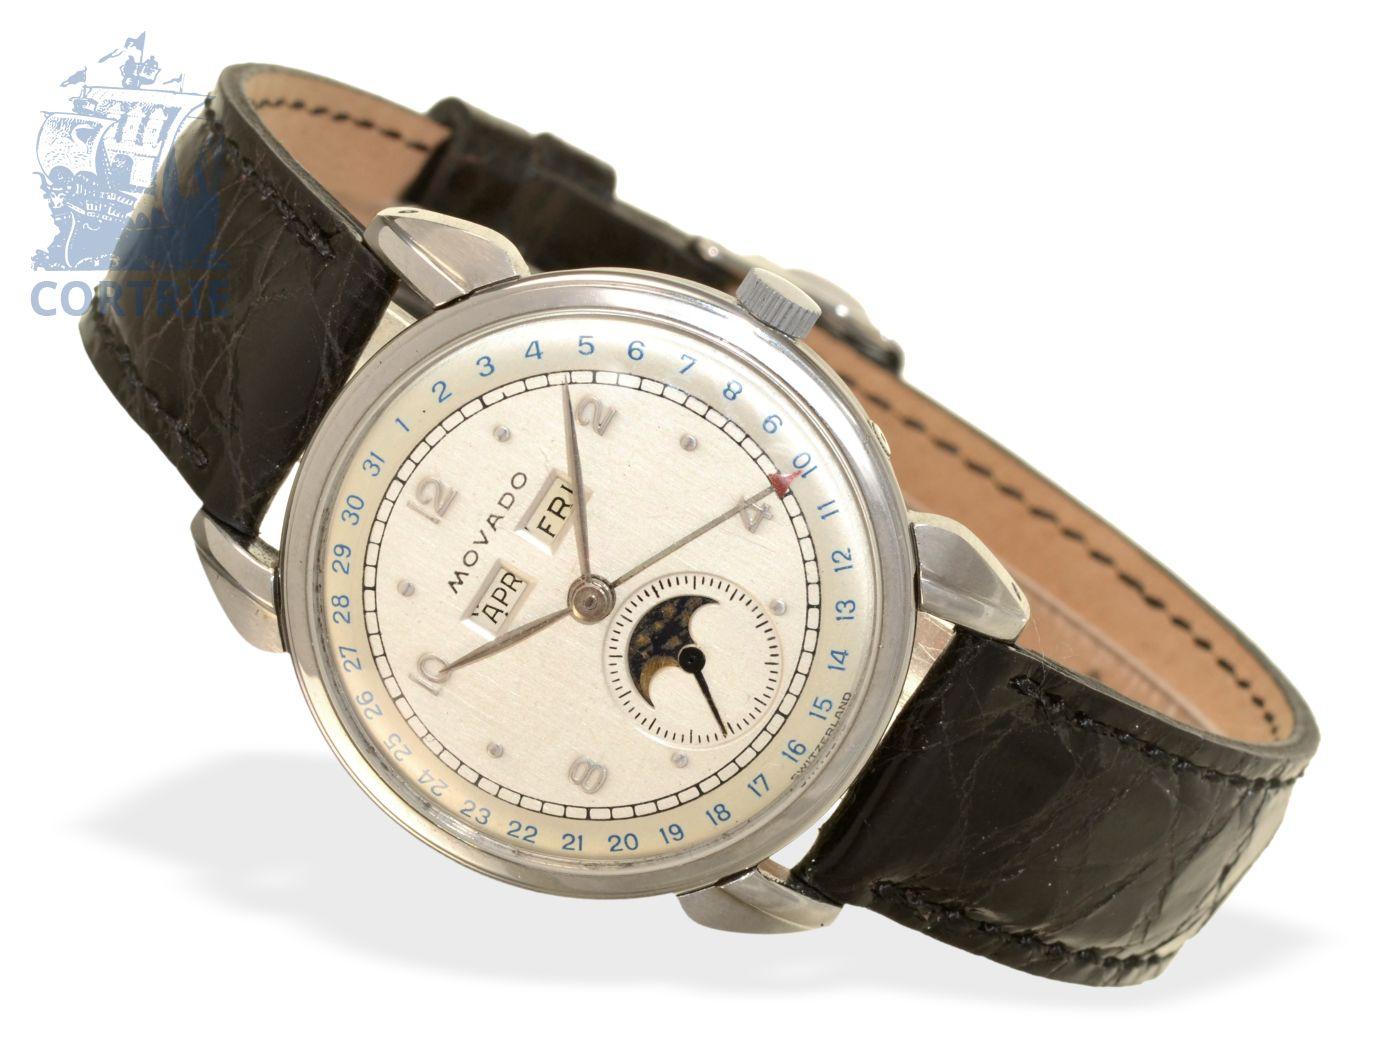 Wristwatch: vintage calendar watch by Movado, excellent condition, ca. 1950-